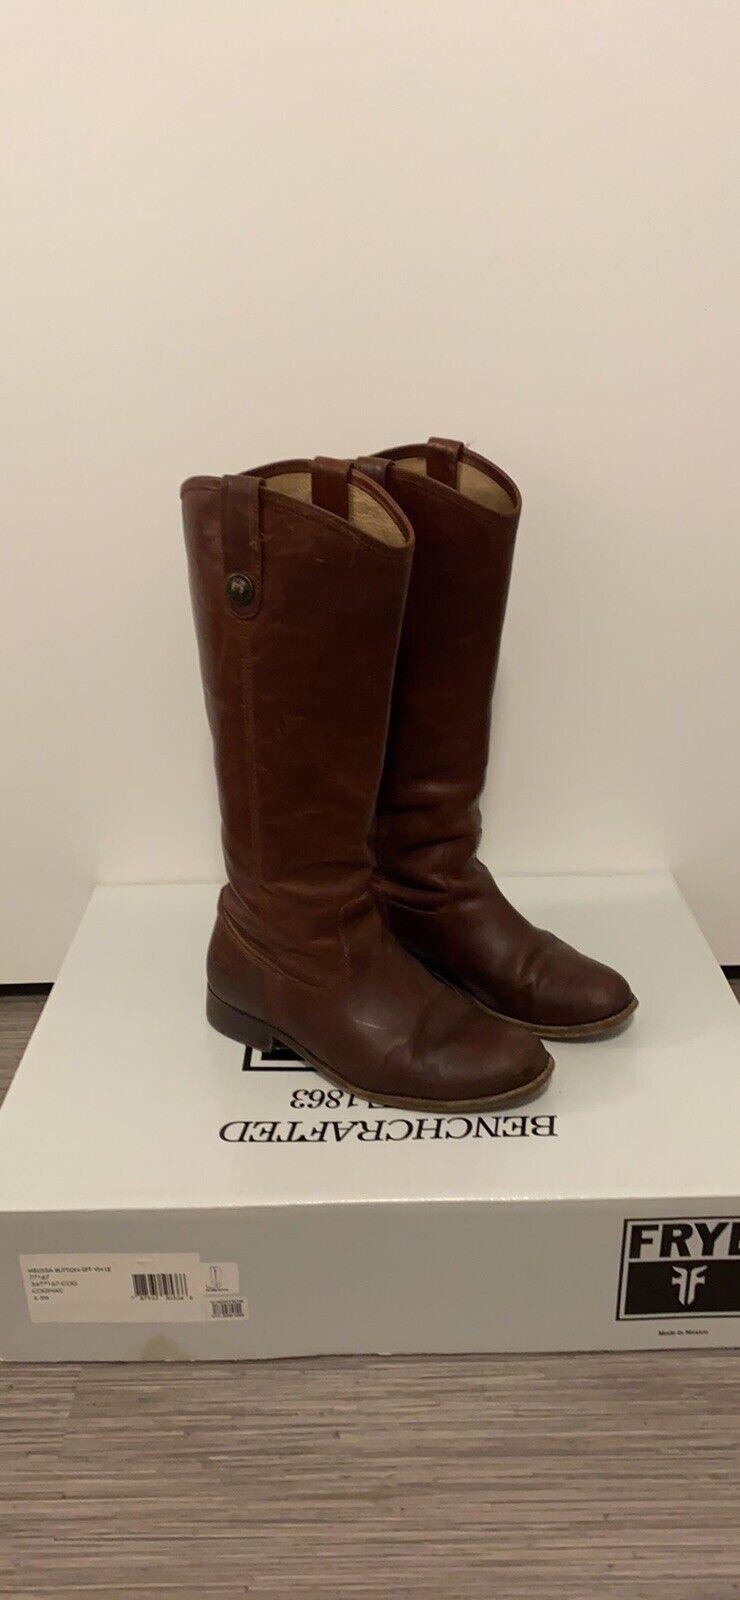 Frye Women's Melissa Button Riding Boots Size 6.5 77167-COG